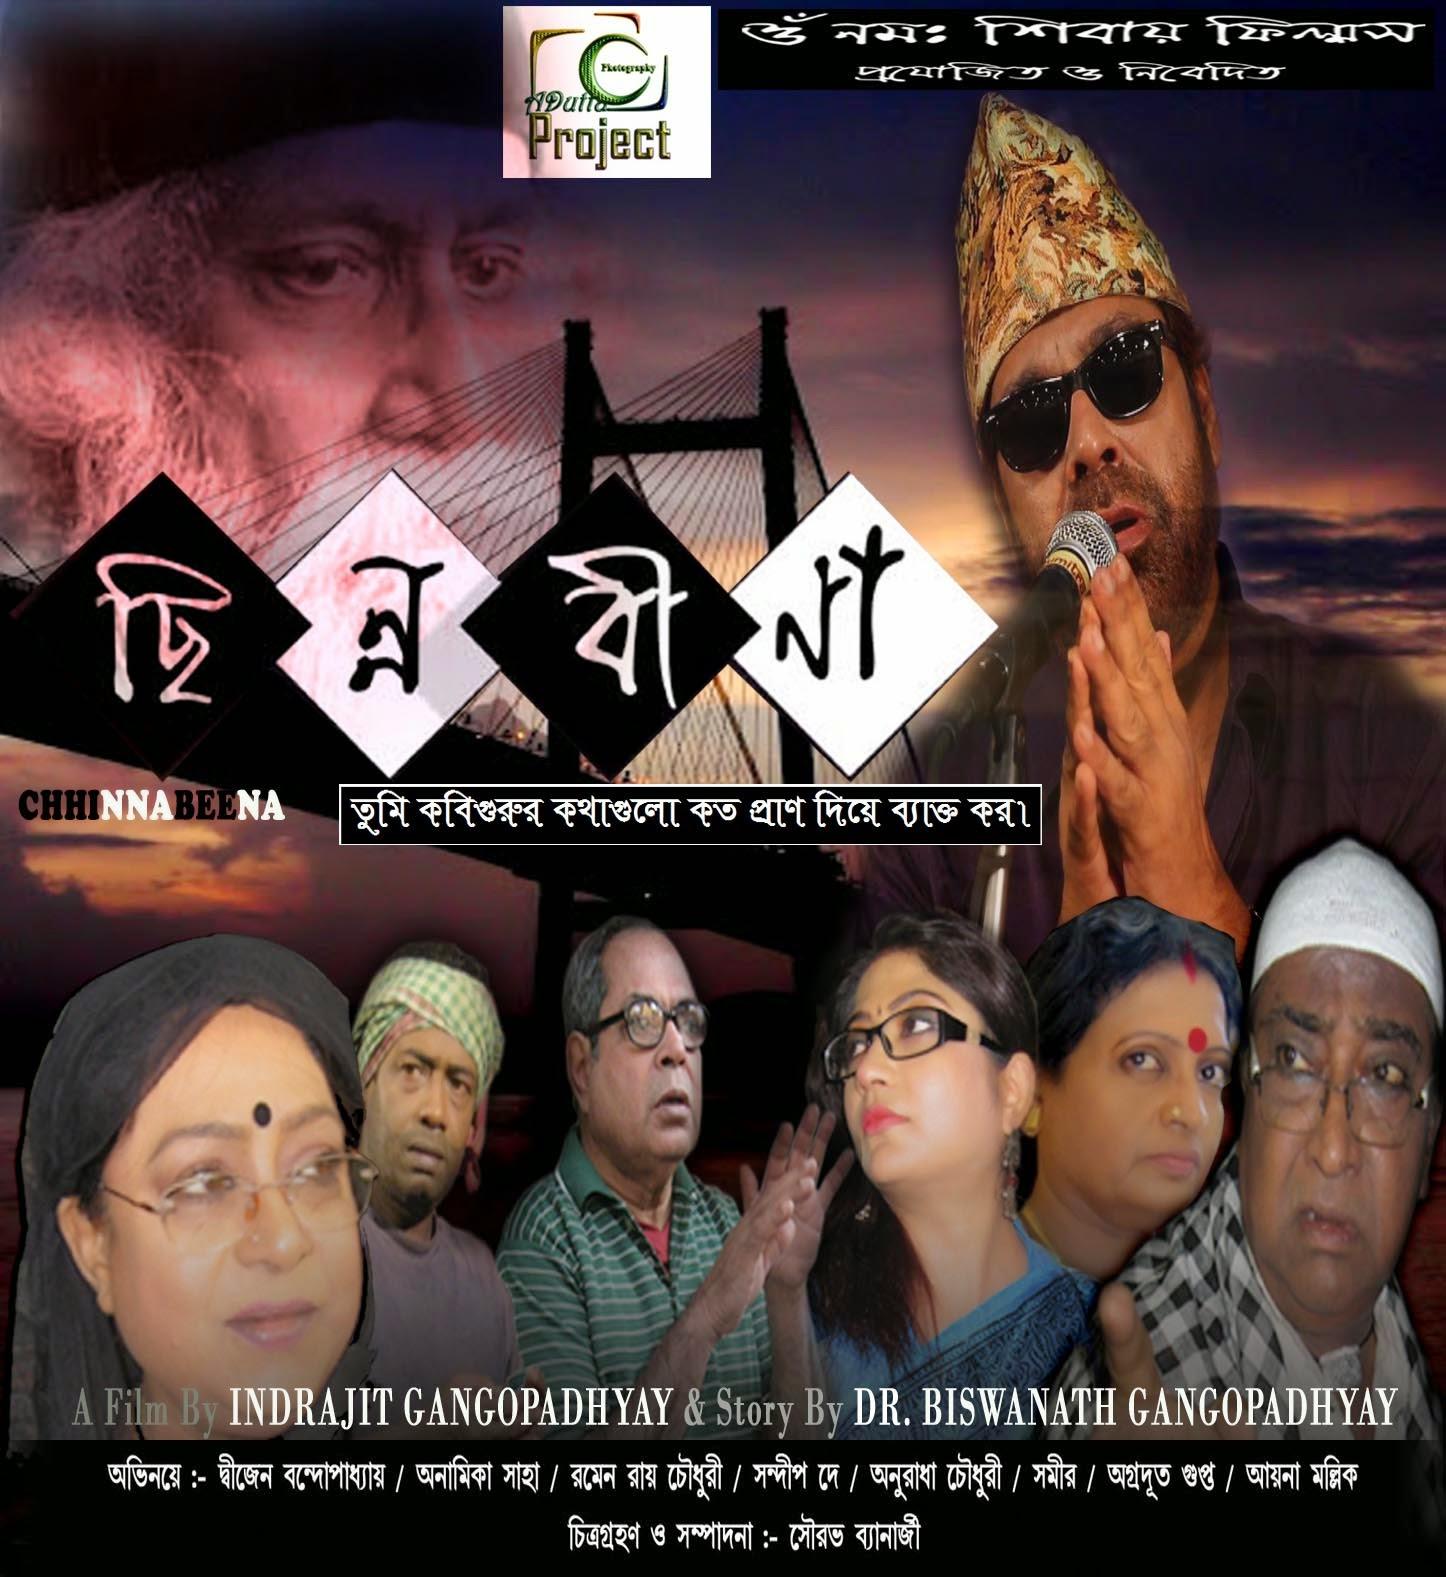 CHHINNABEENA- Rabindra Sangeet By Indrajit Gangopadhyay(PUJA Special songs )